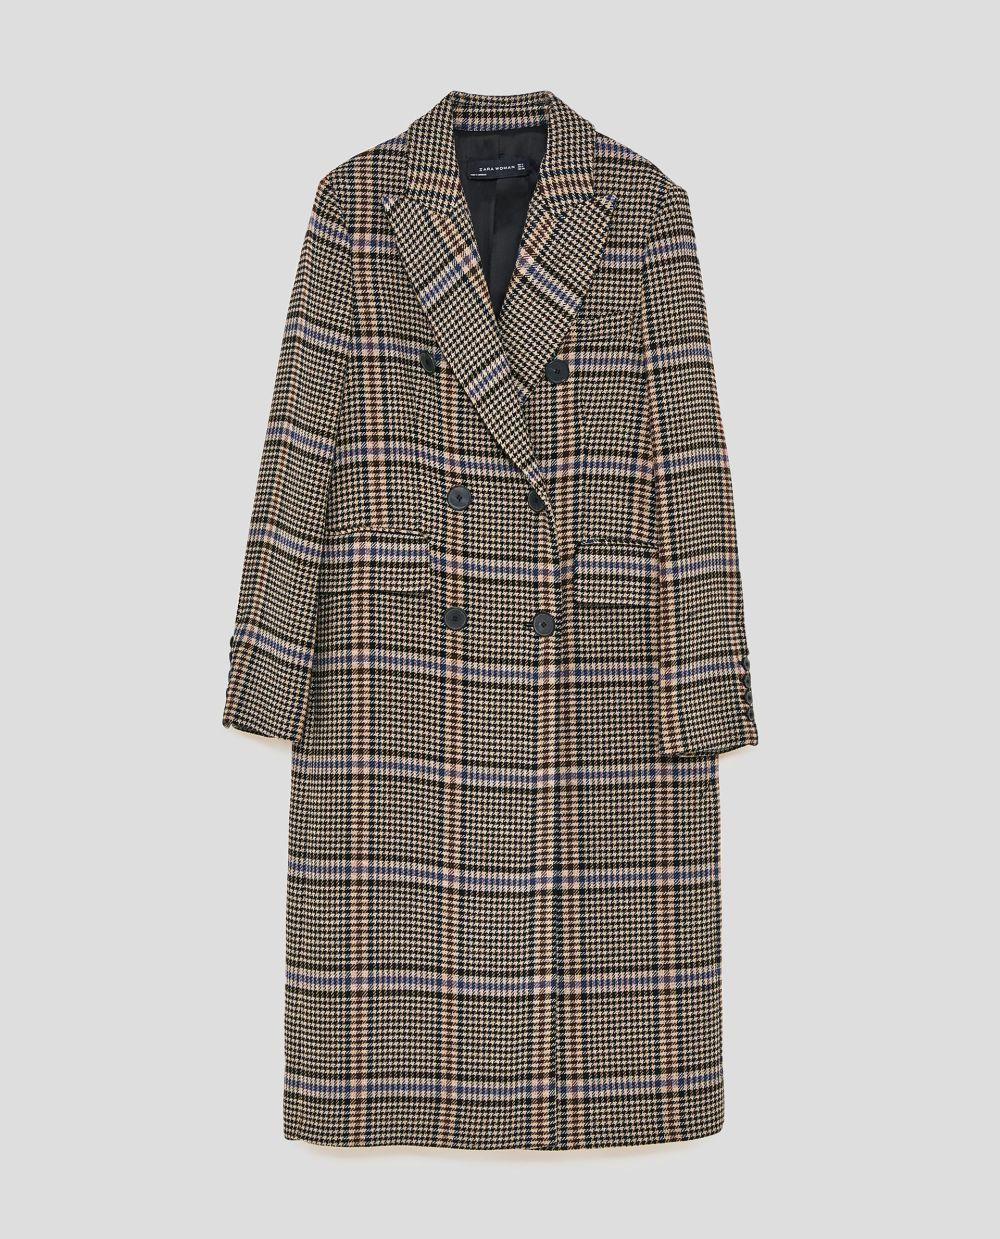 Abrigo de cuadros oversize de Zara (79,99 euros)